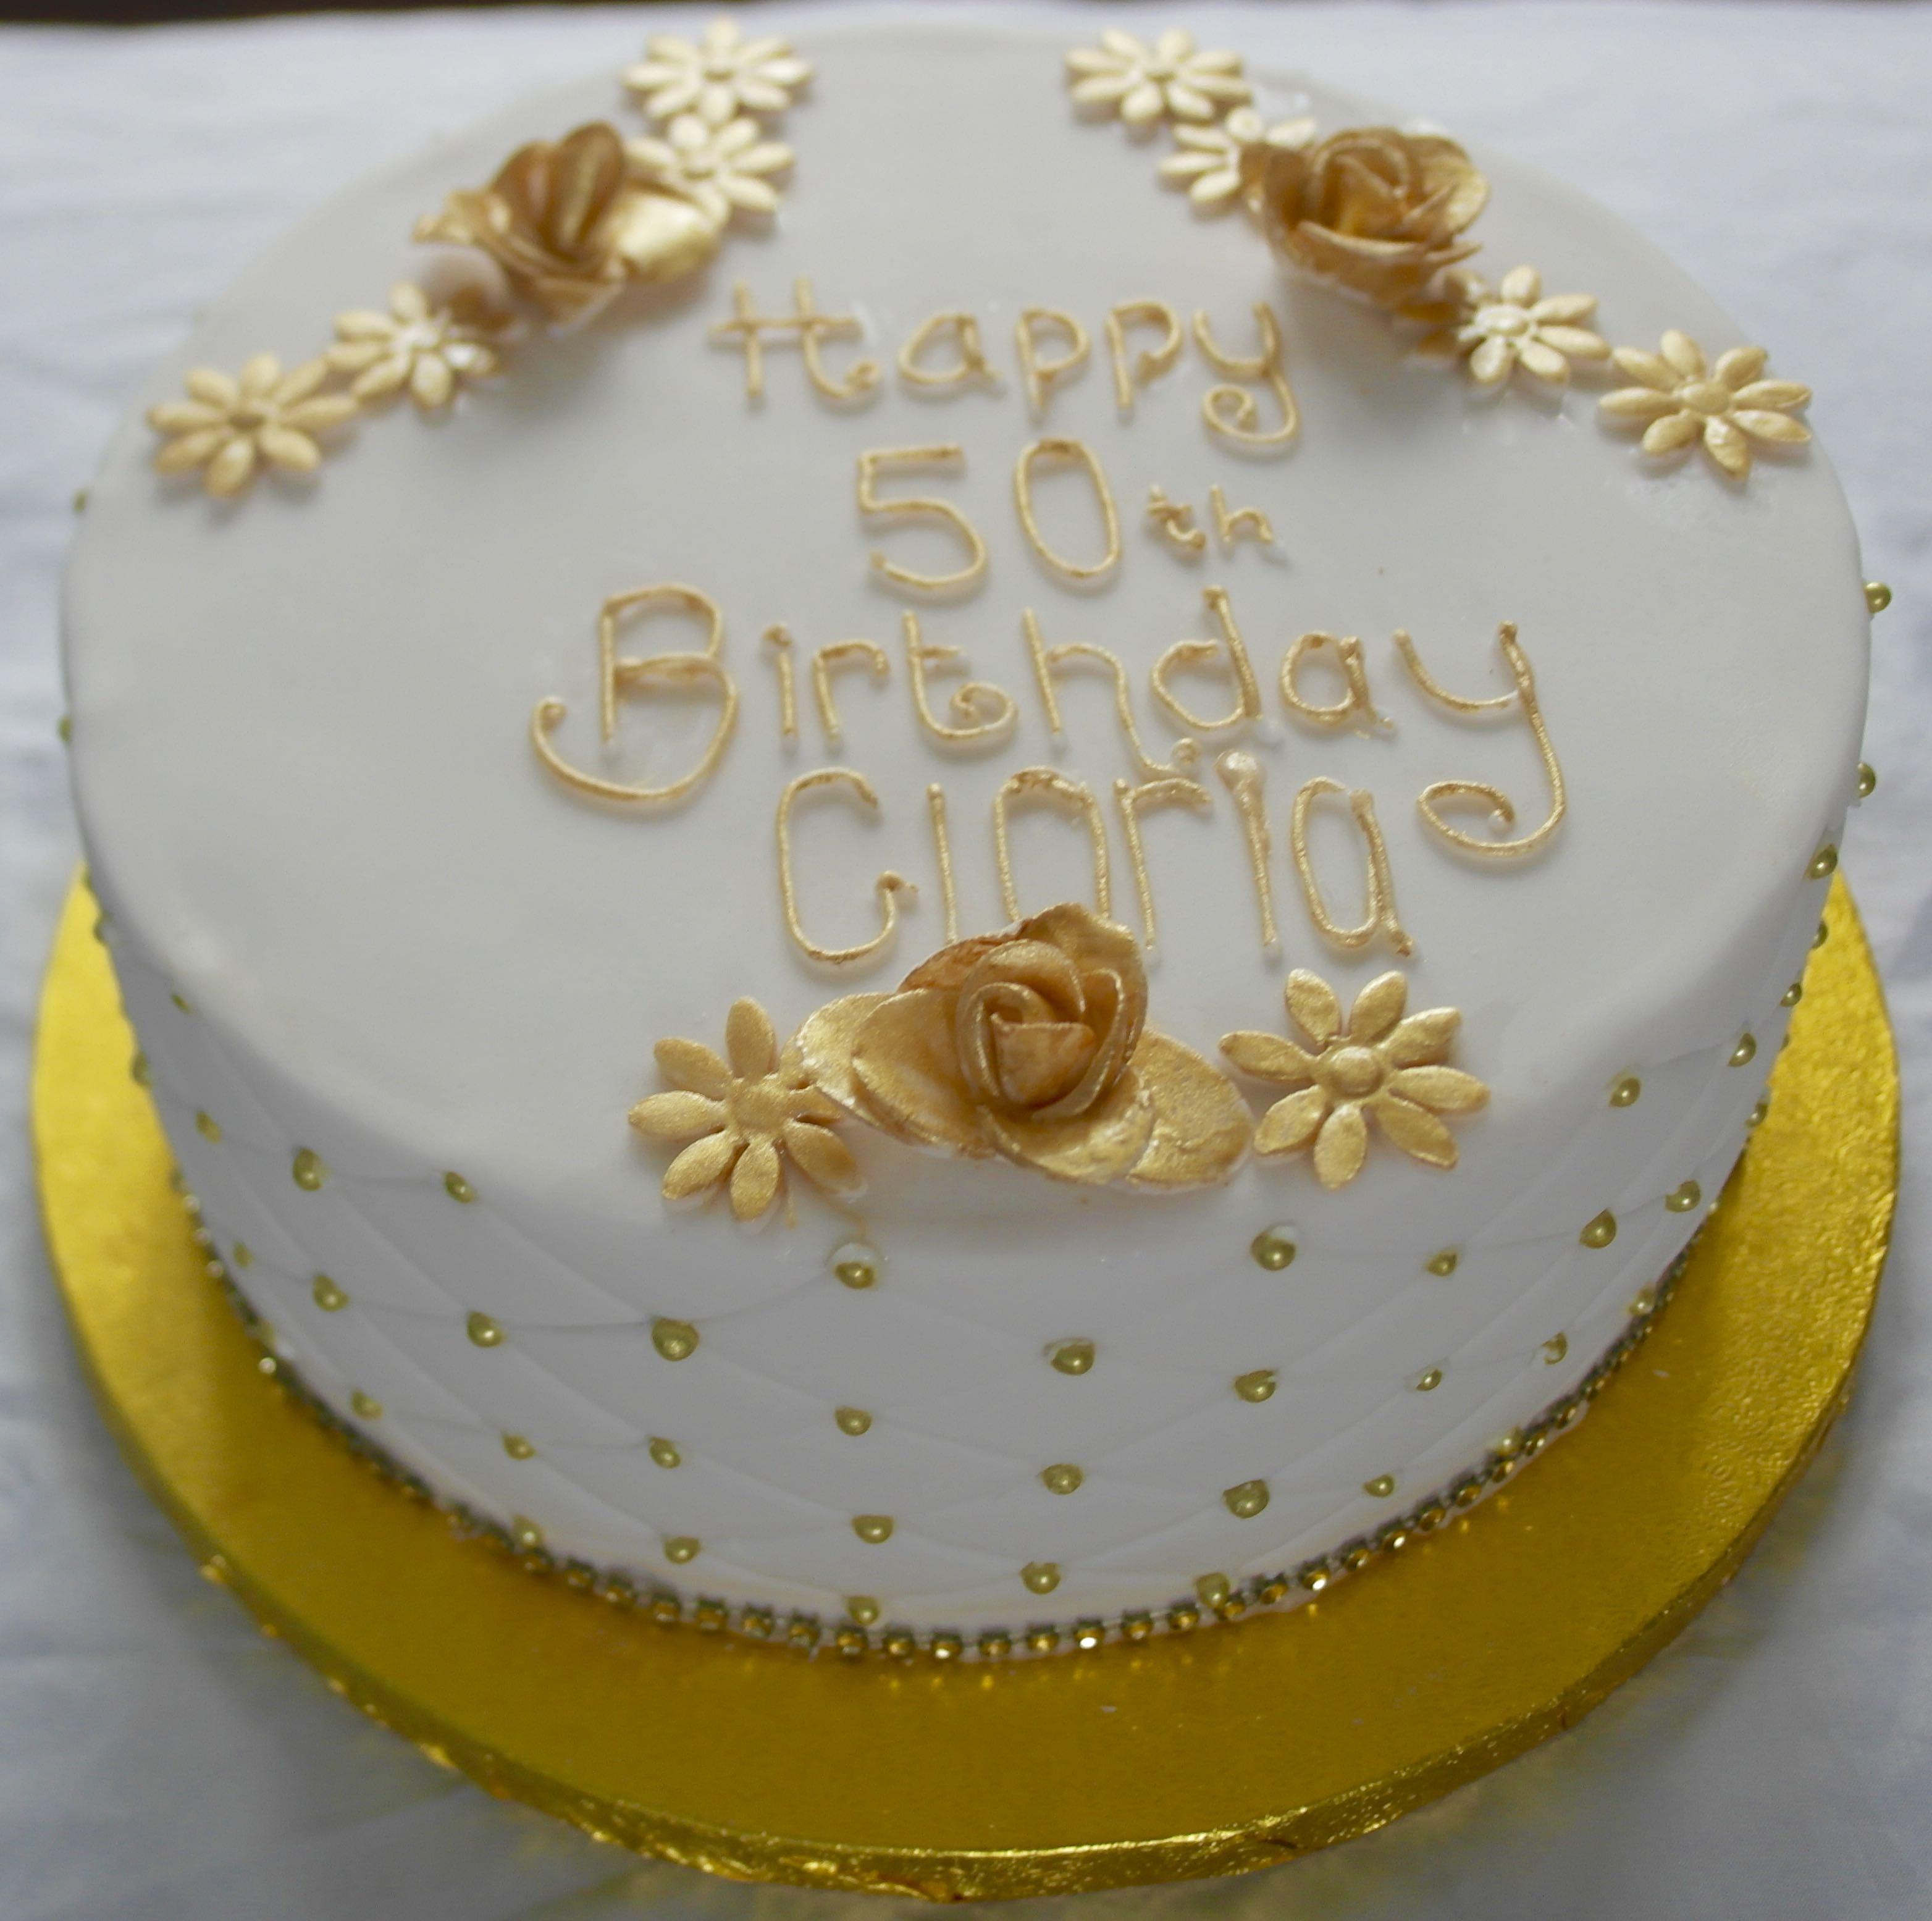 50th Birthday Cake with Pin Cushion Design